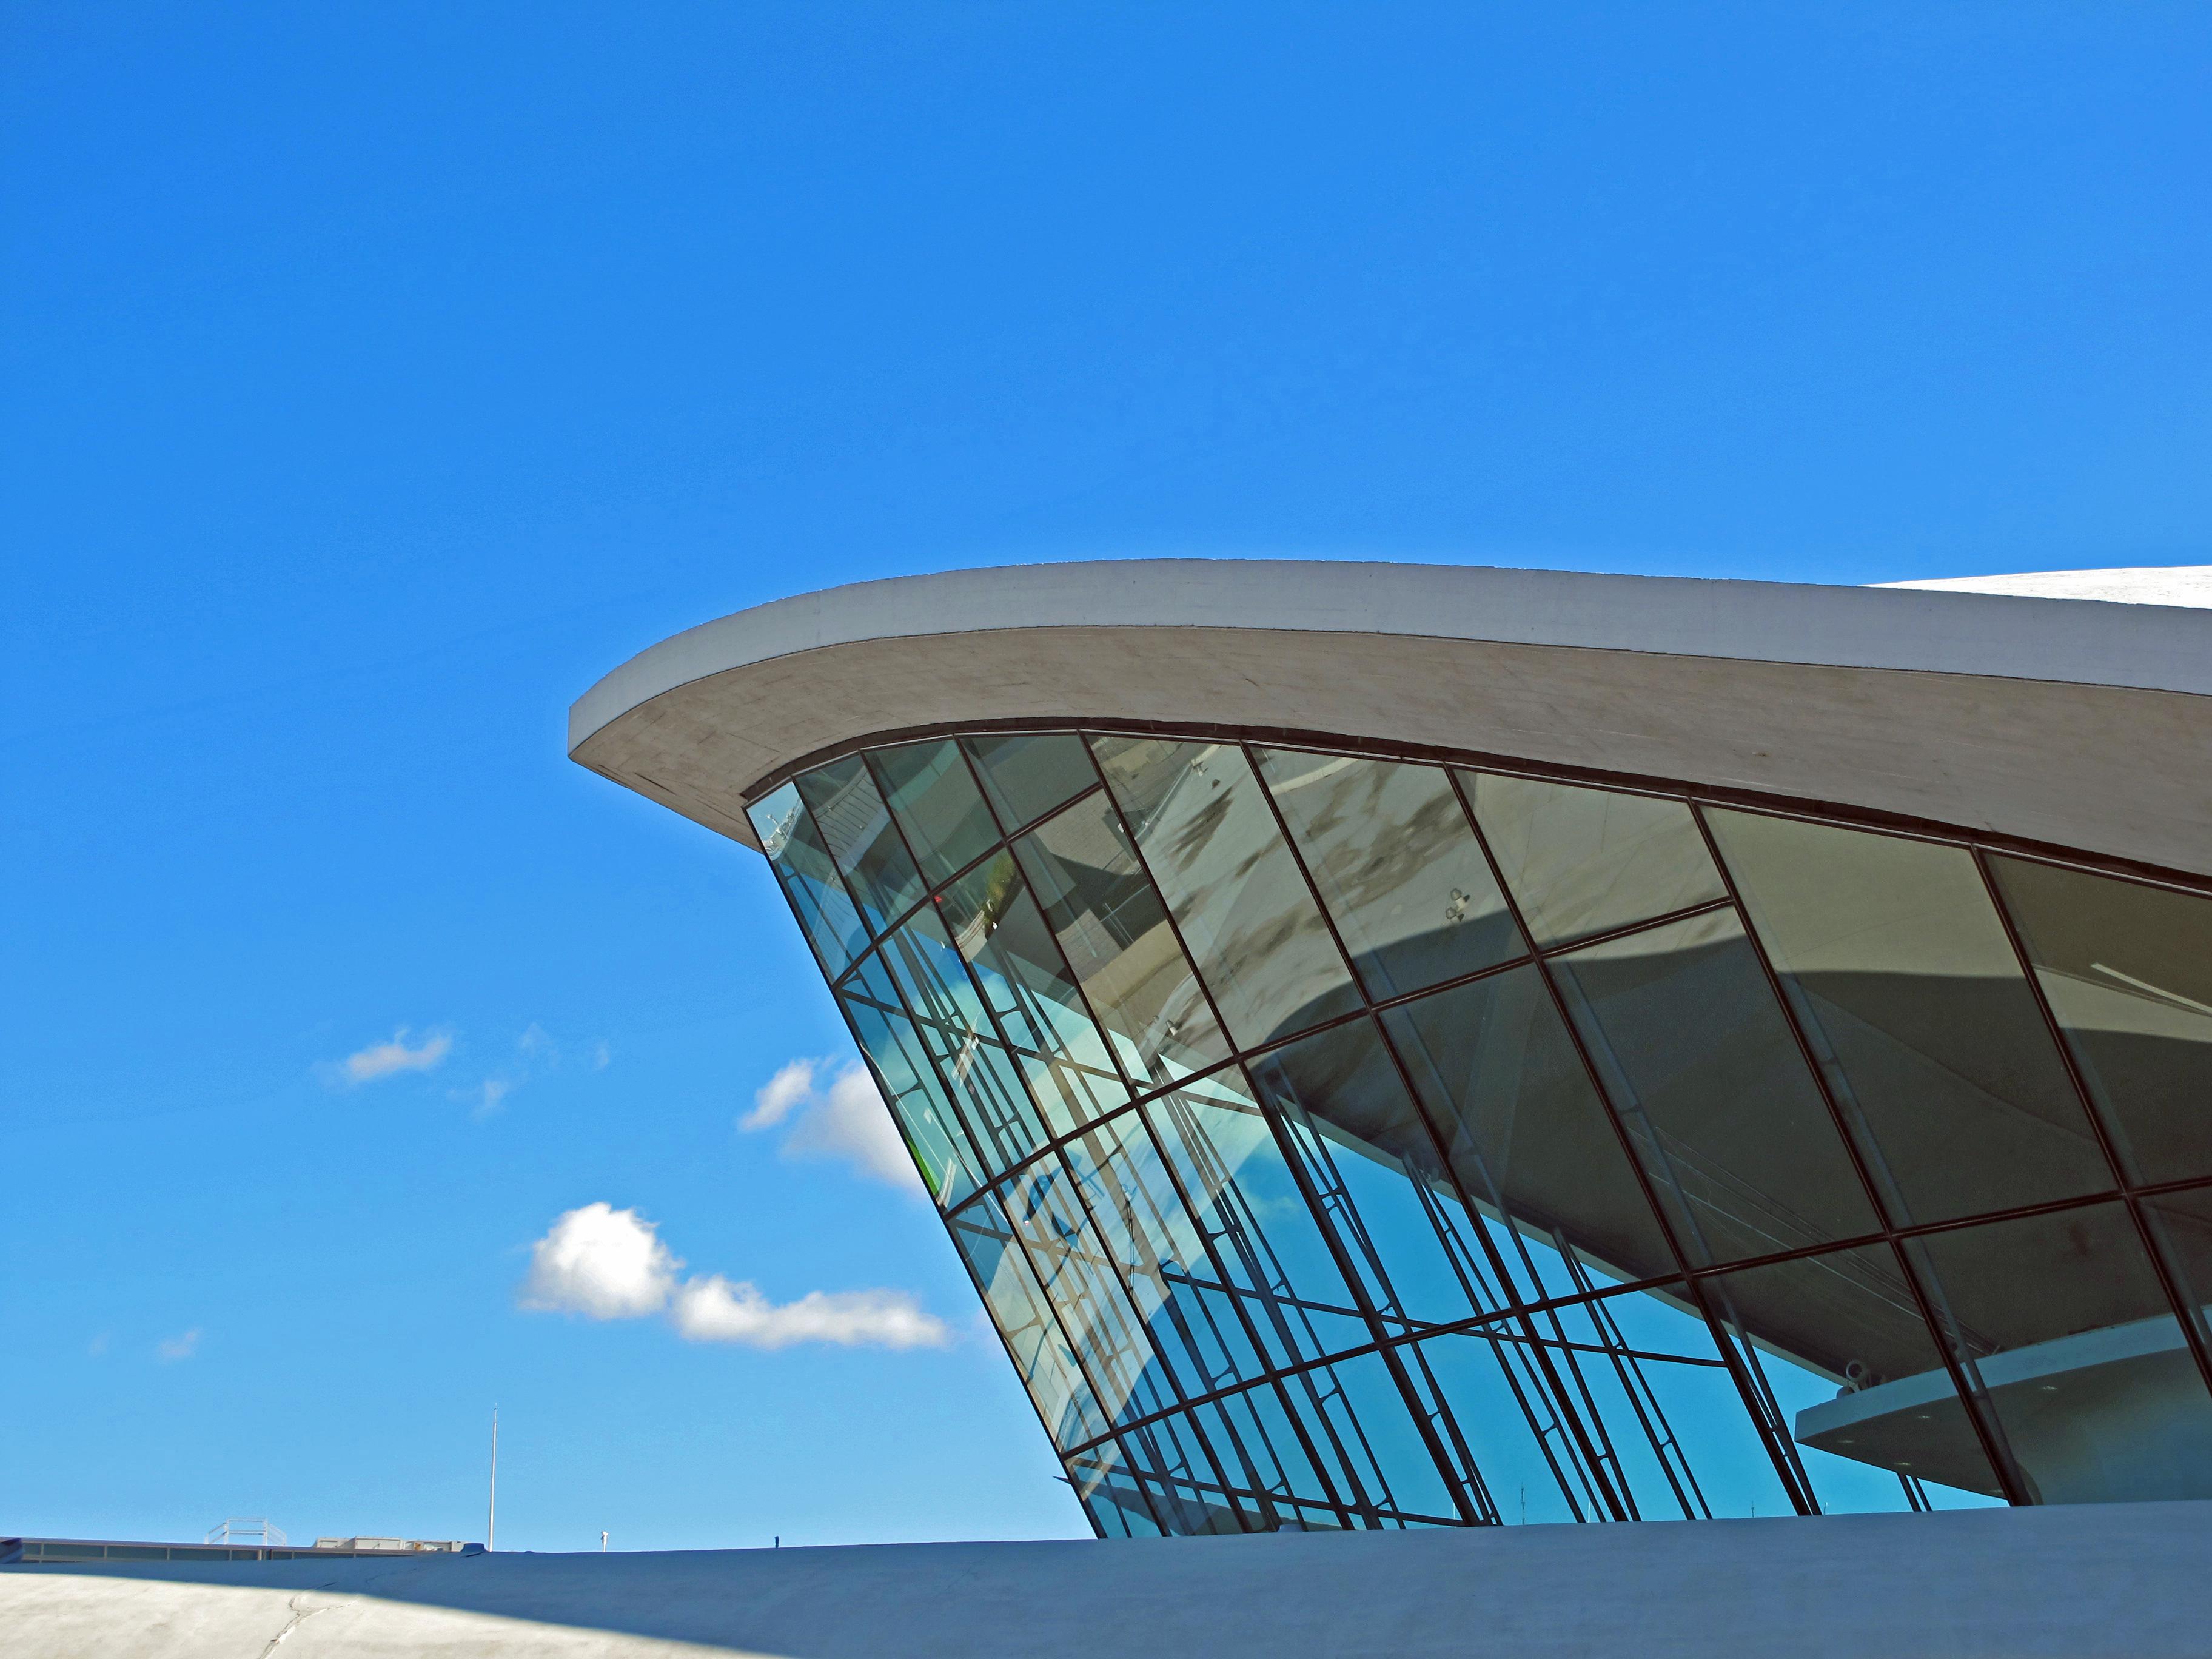 Saarinen TWA terminal at JFK